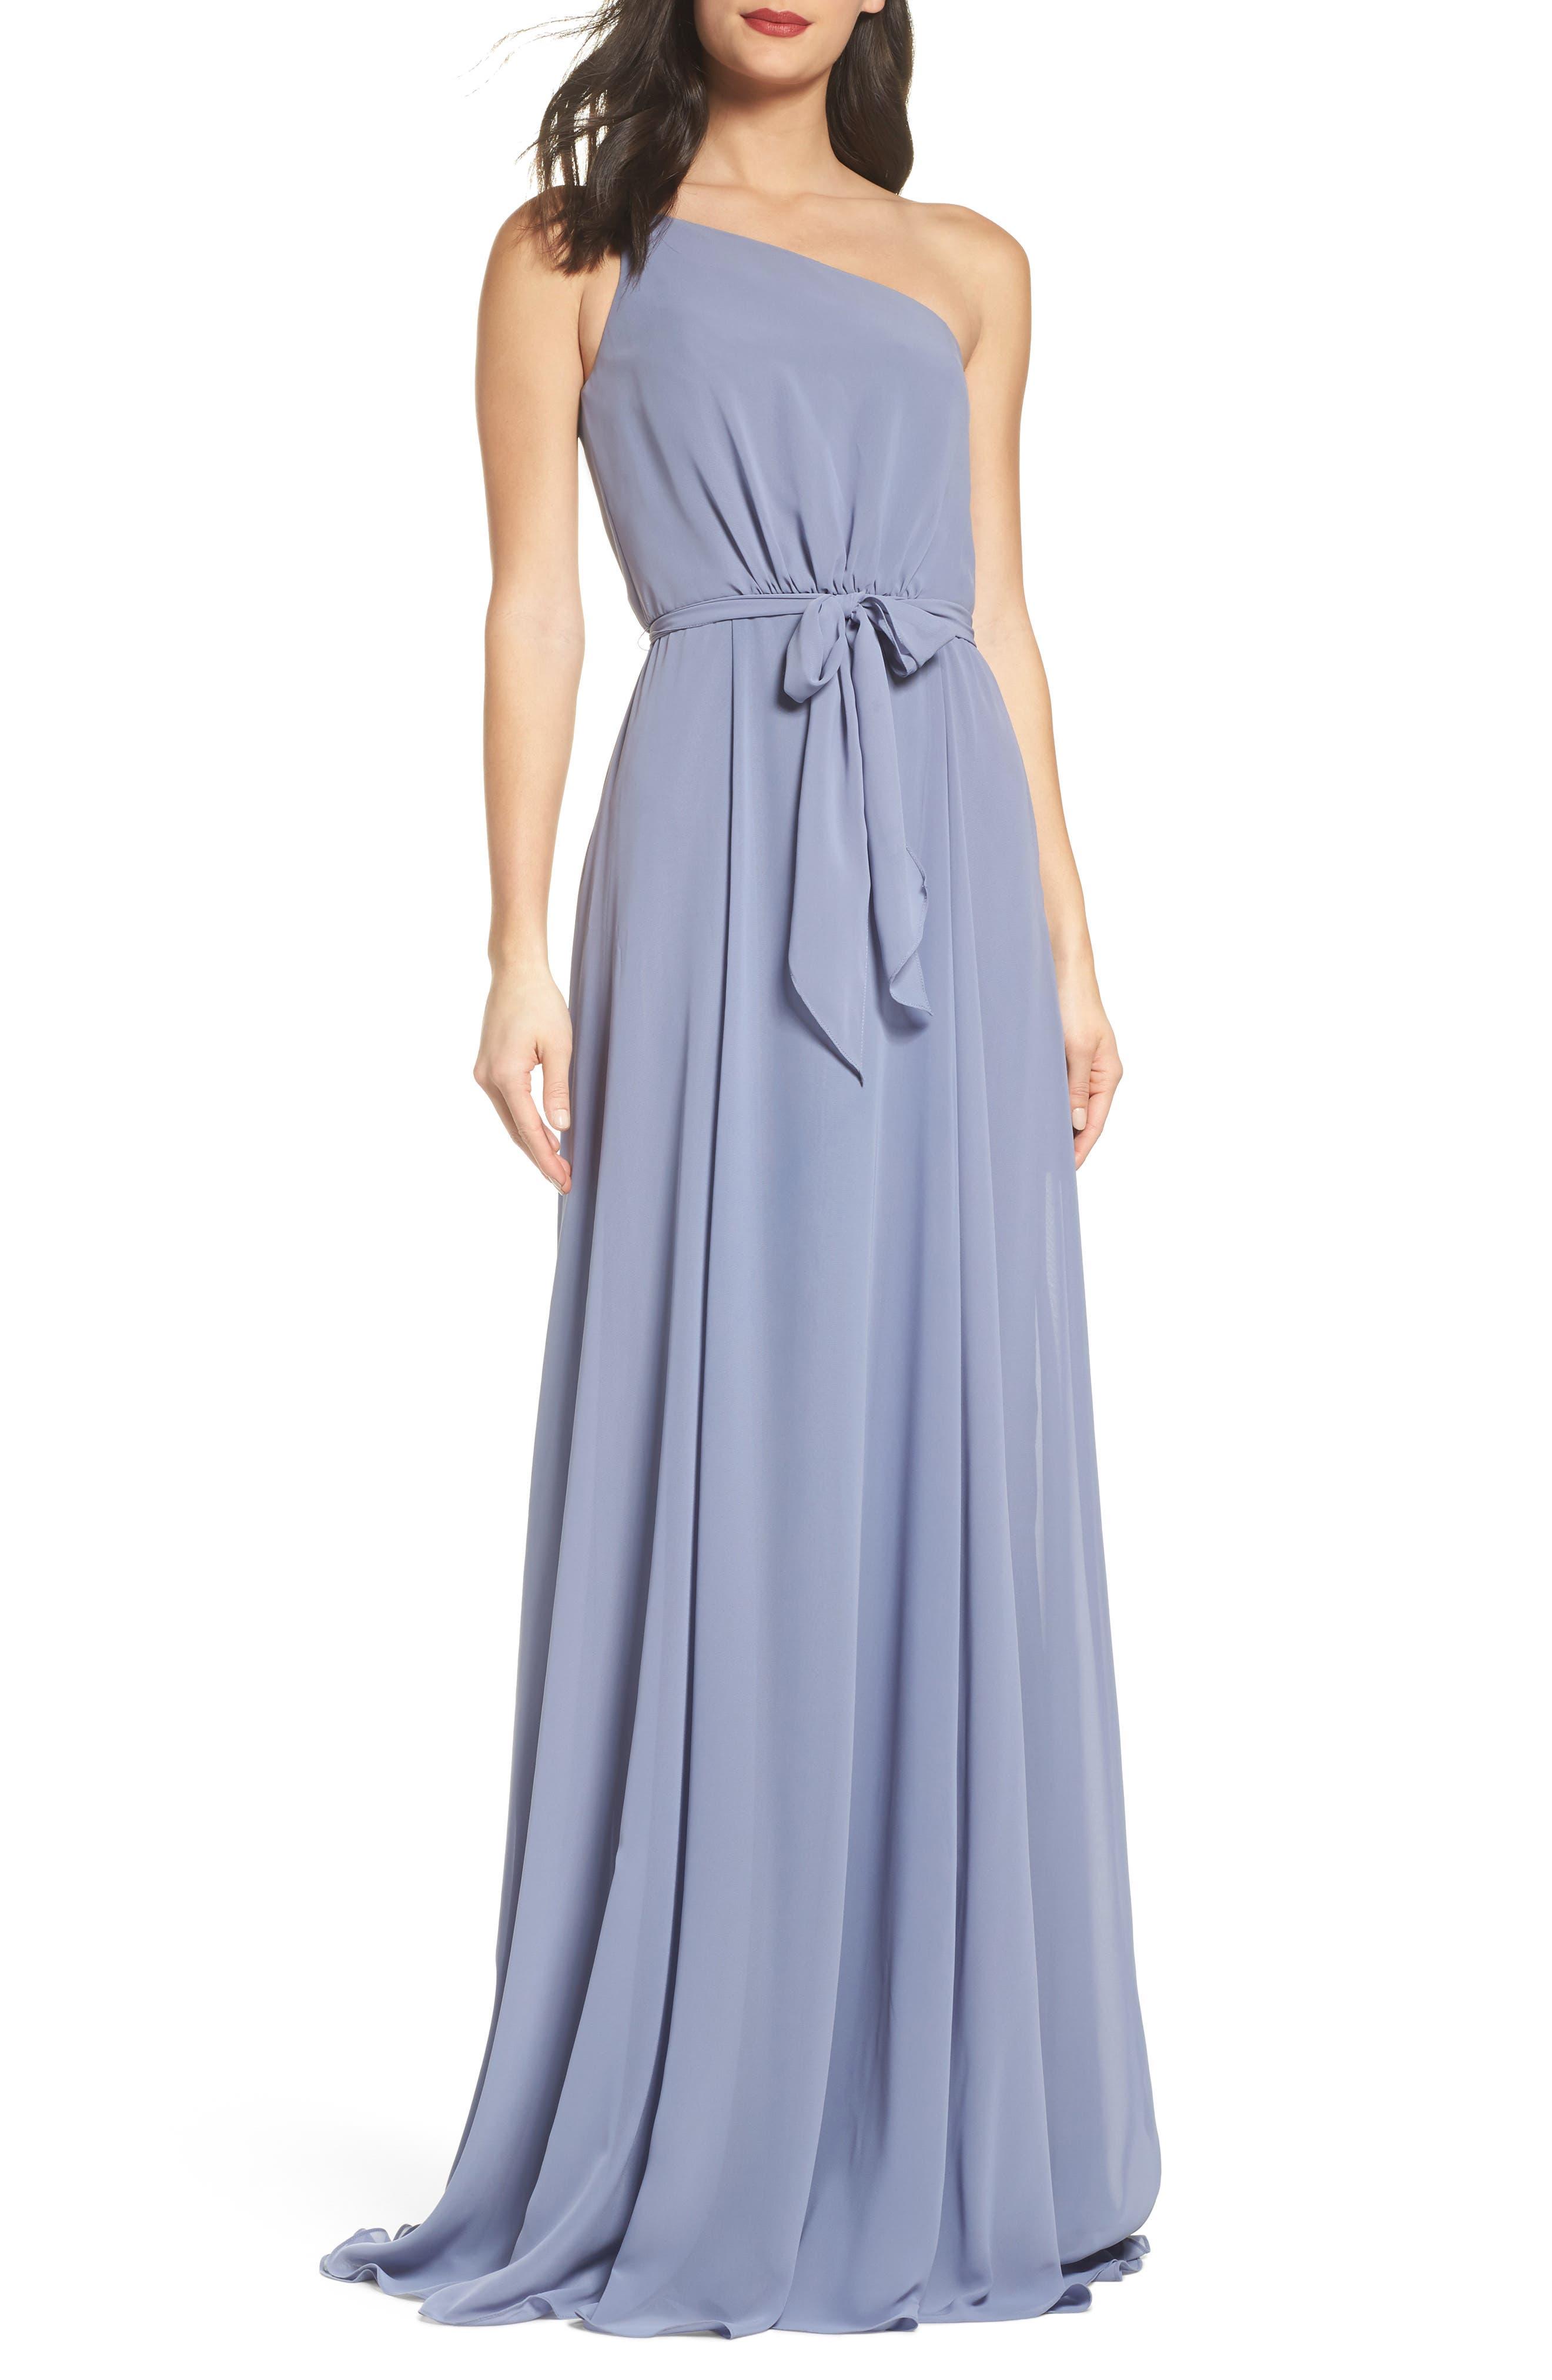 One-Shoulder Chiffon A-Line Gown,                         Main,                         color, 020